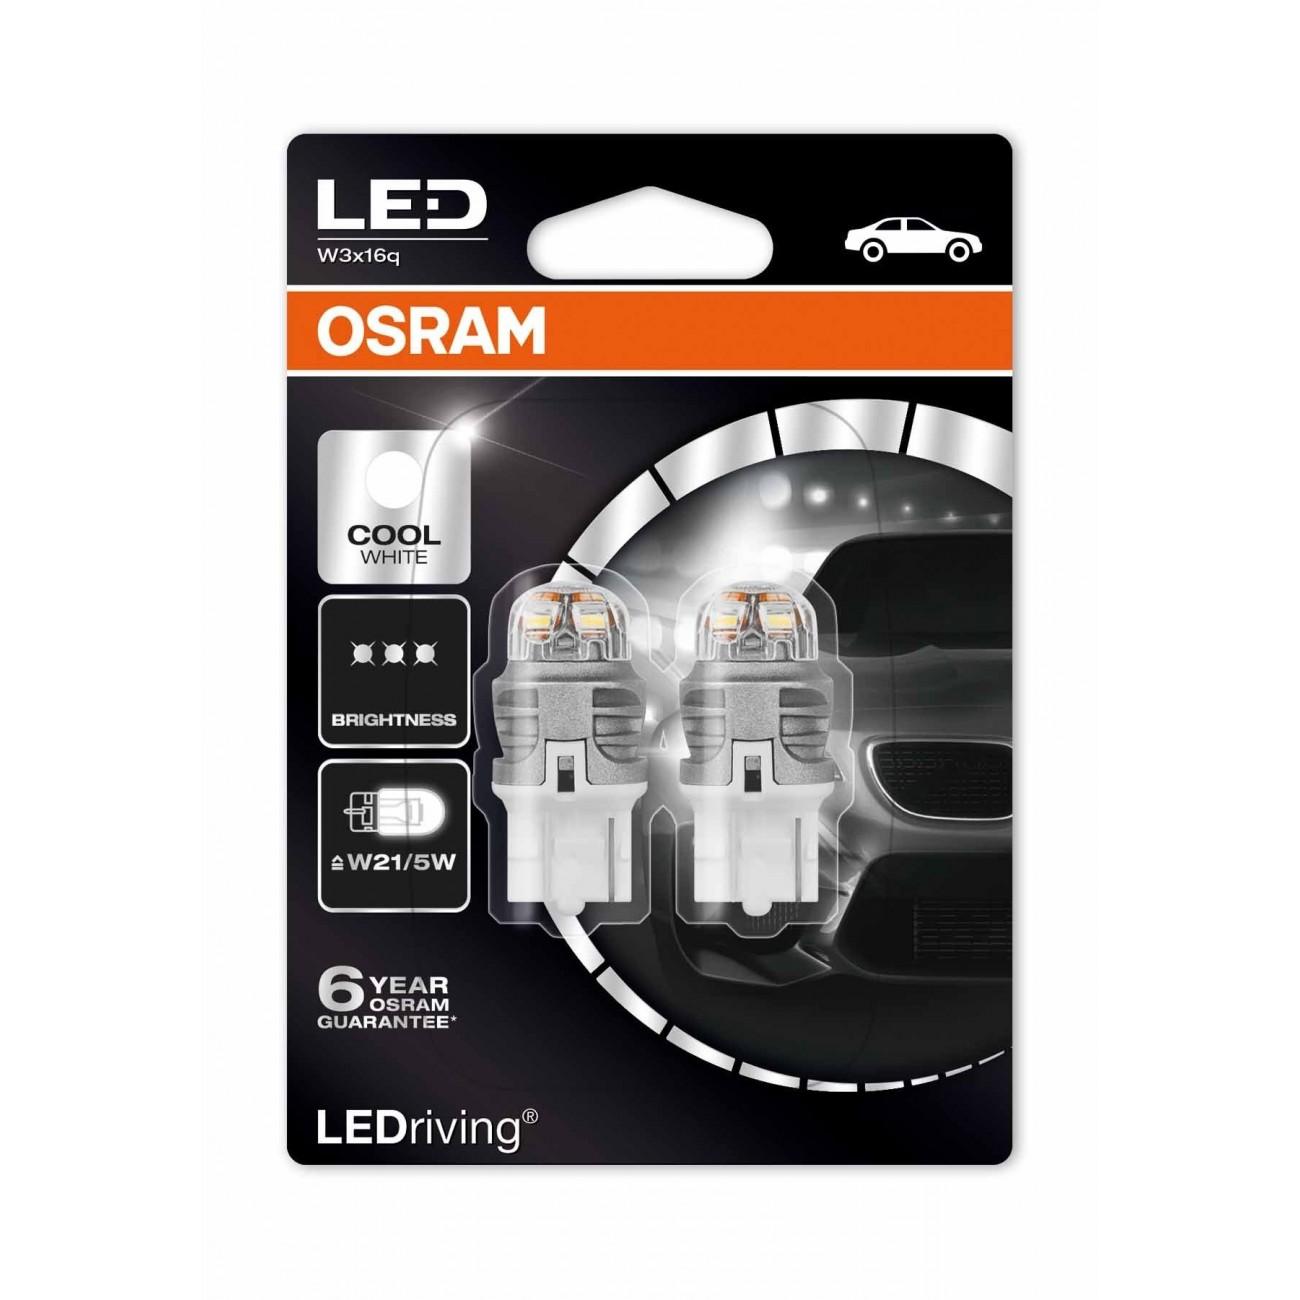 Osram MT-7915CW-02B Iluminación Led